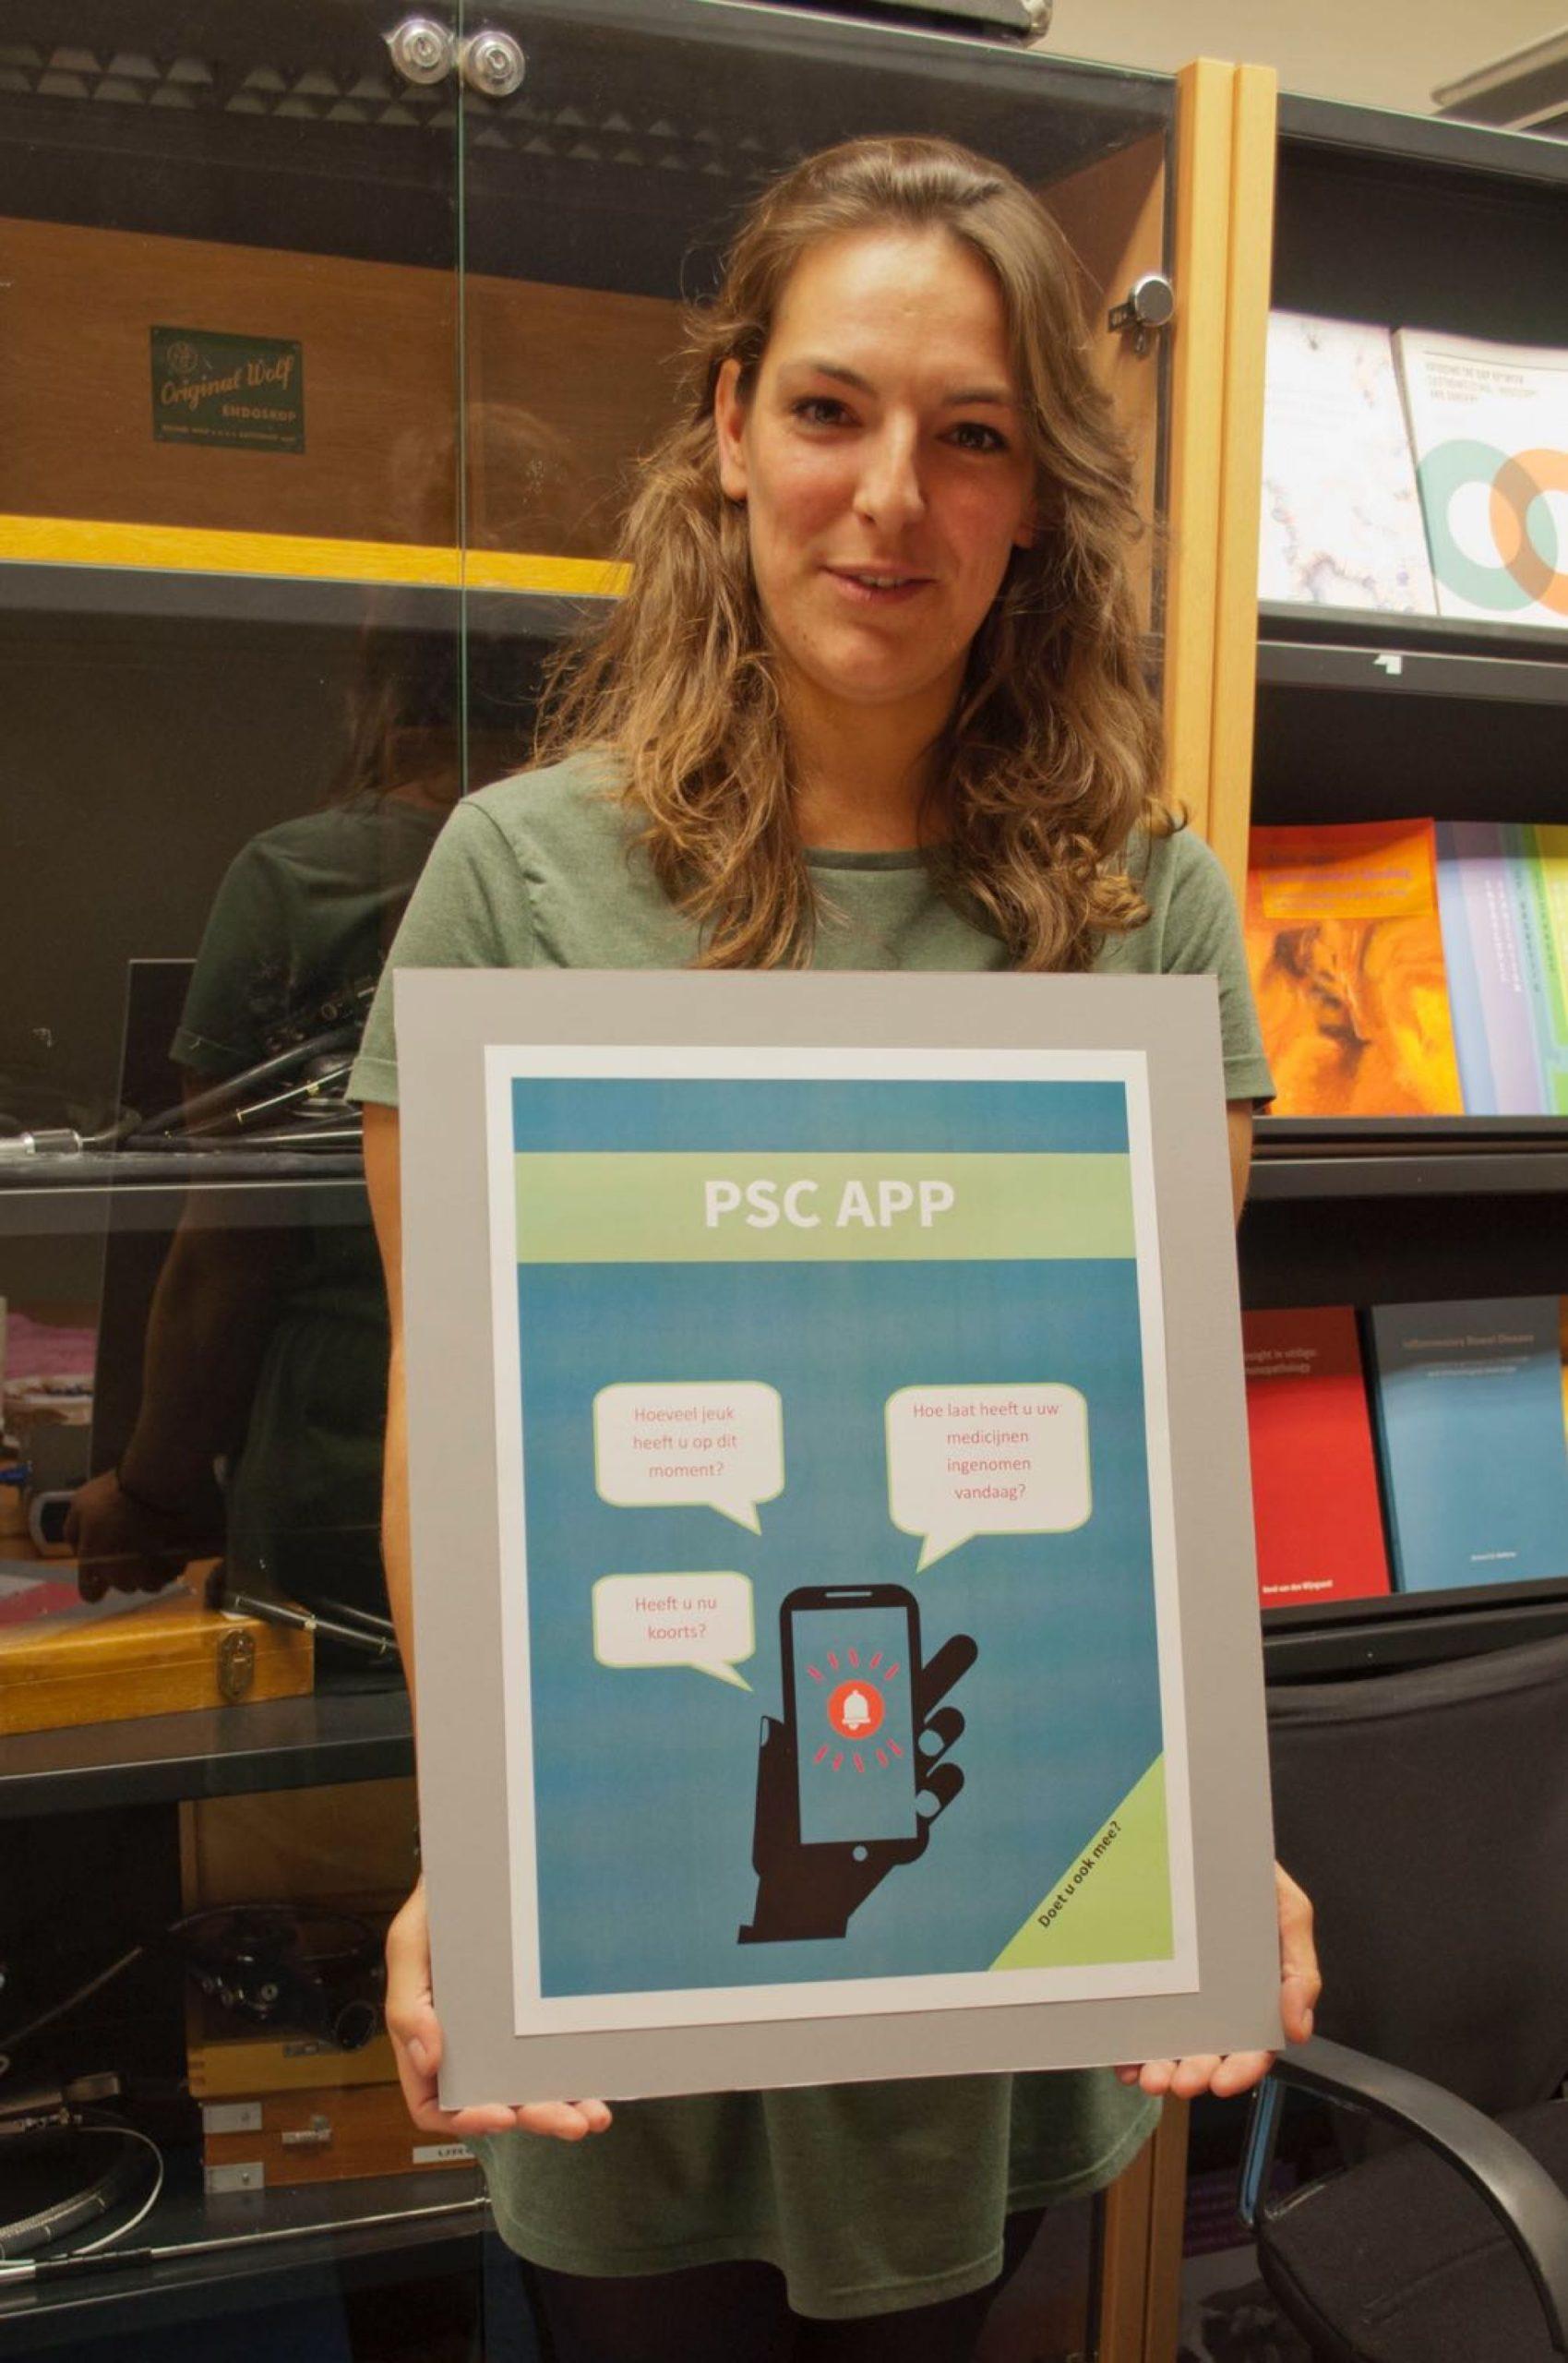 PSC app